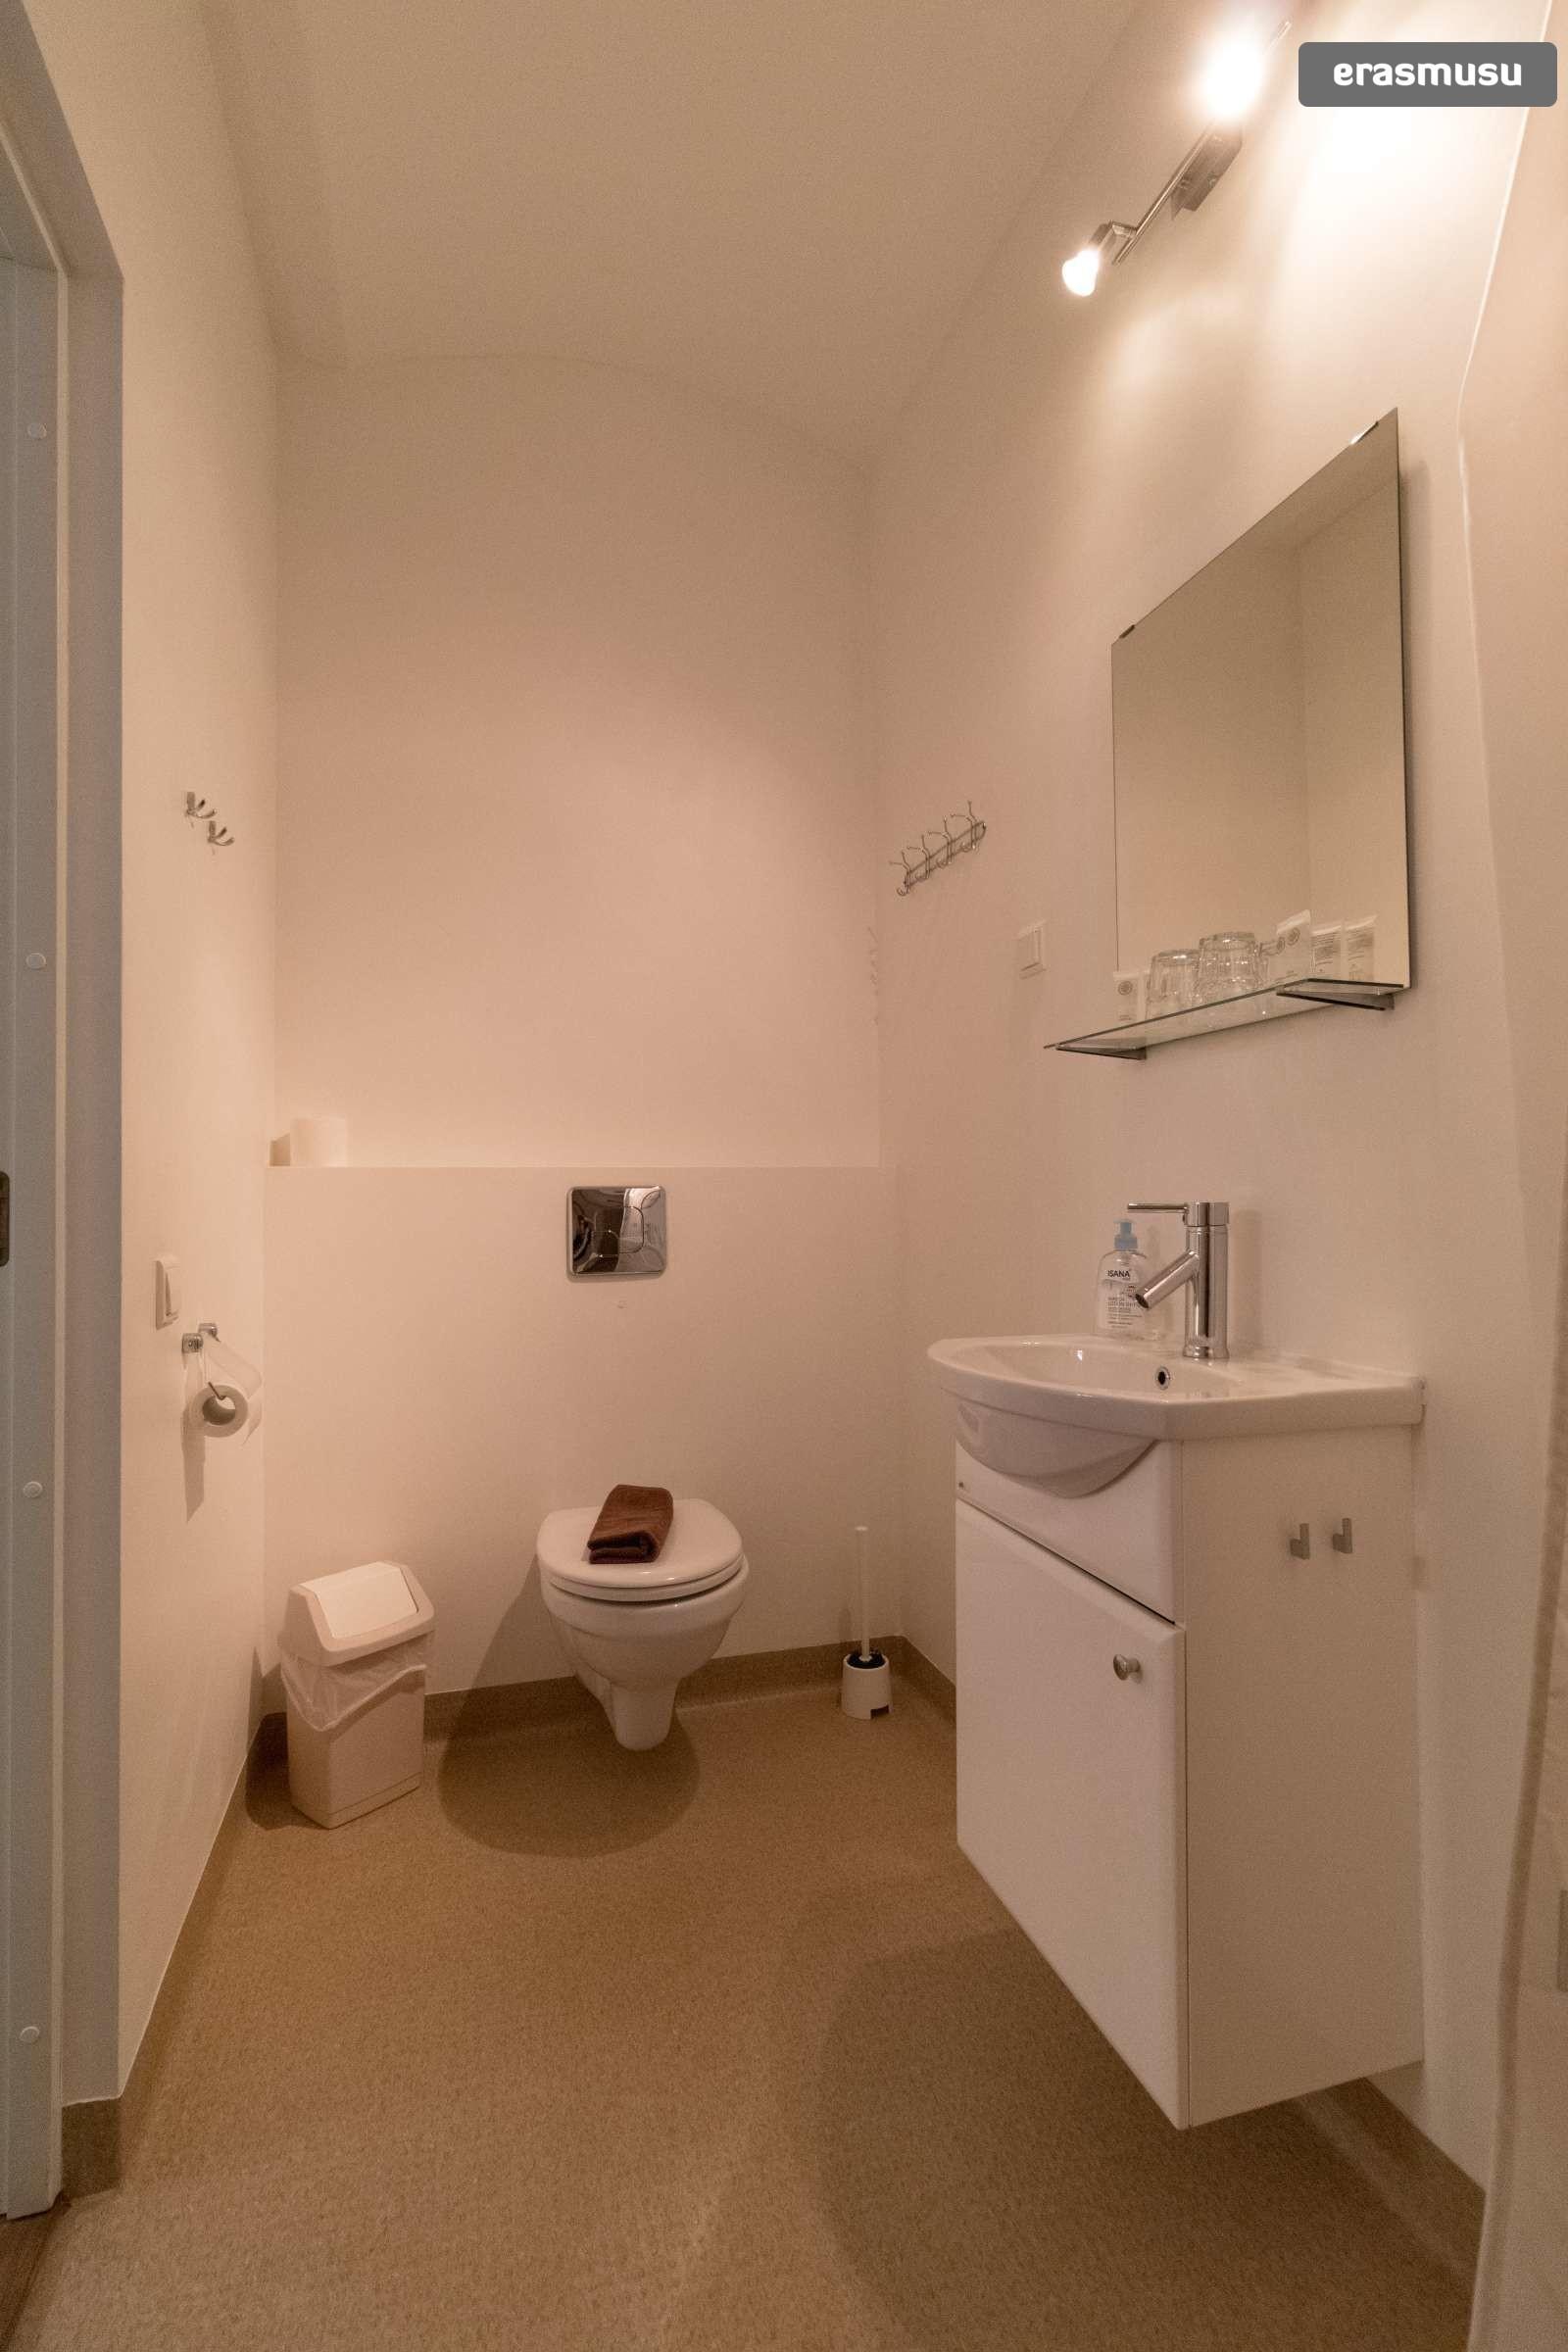 spacious-ensuite-room-kitchenette-rent-agenskalns-8c2677220d3569